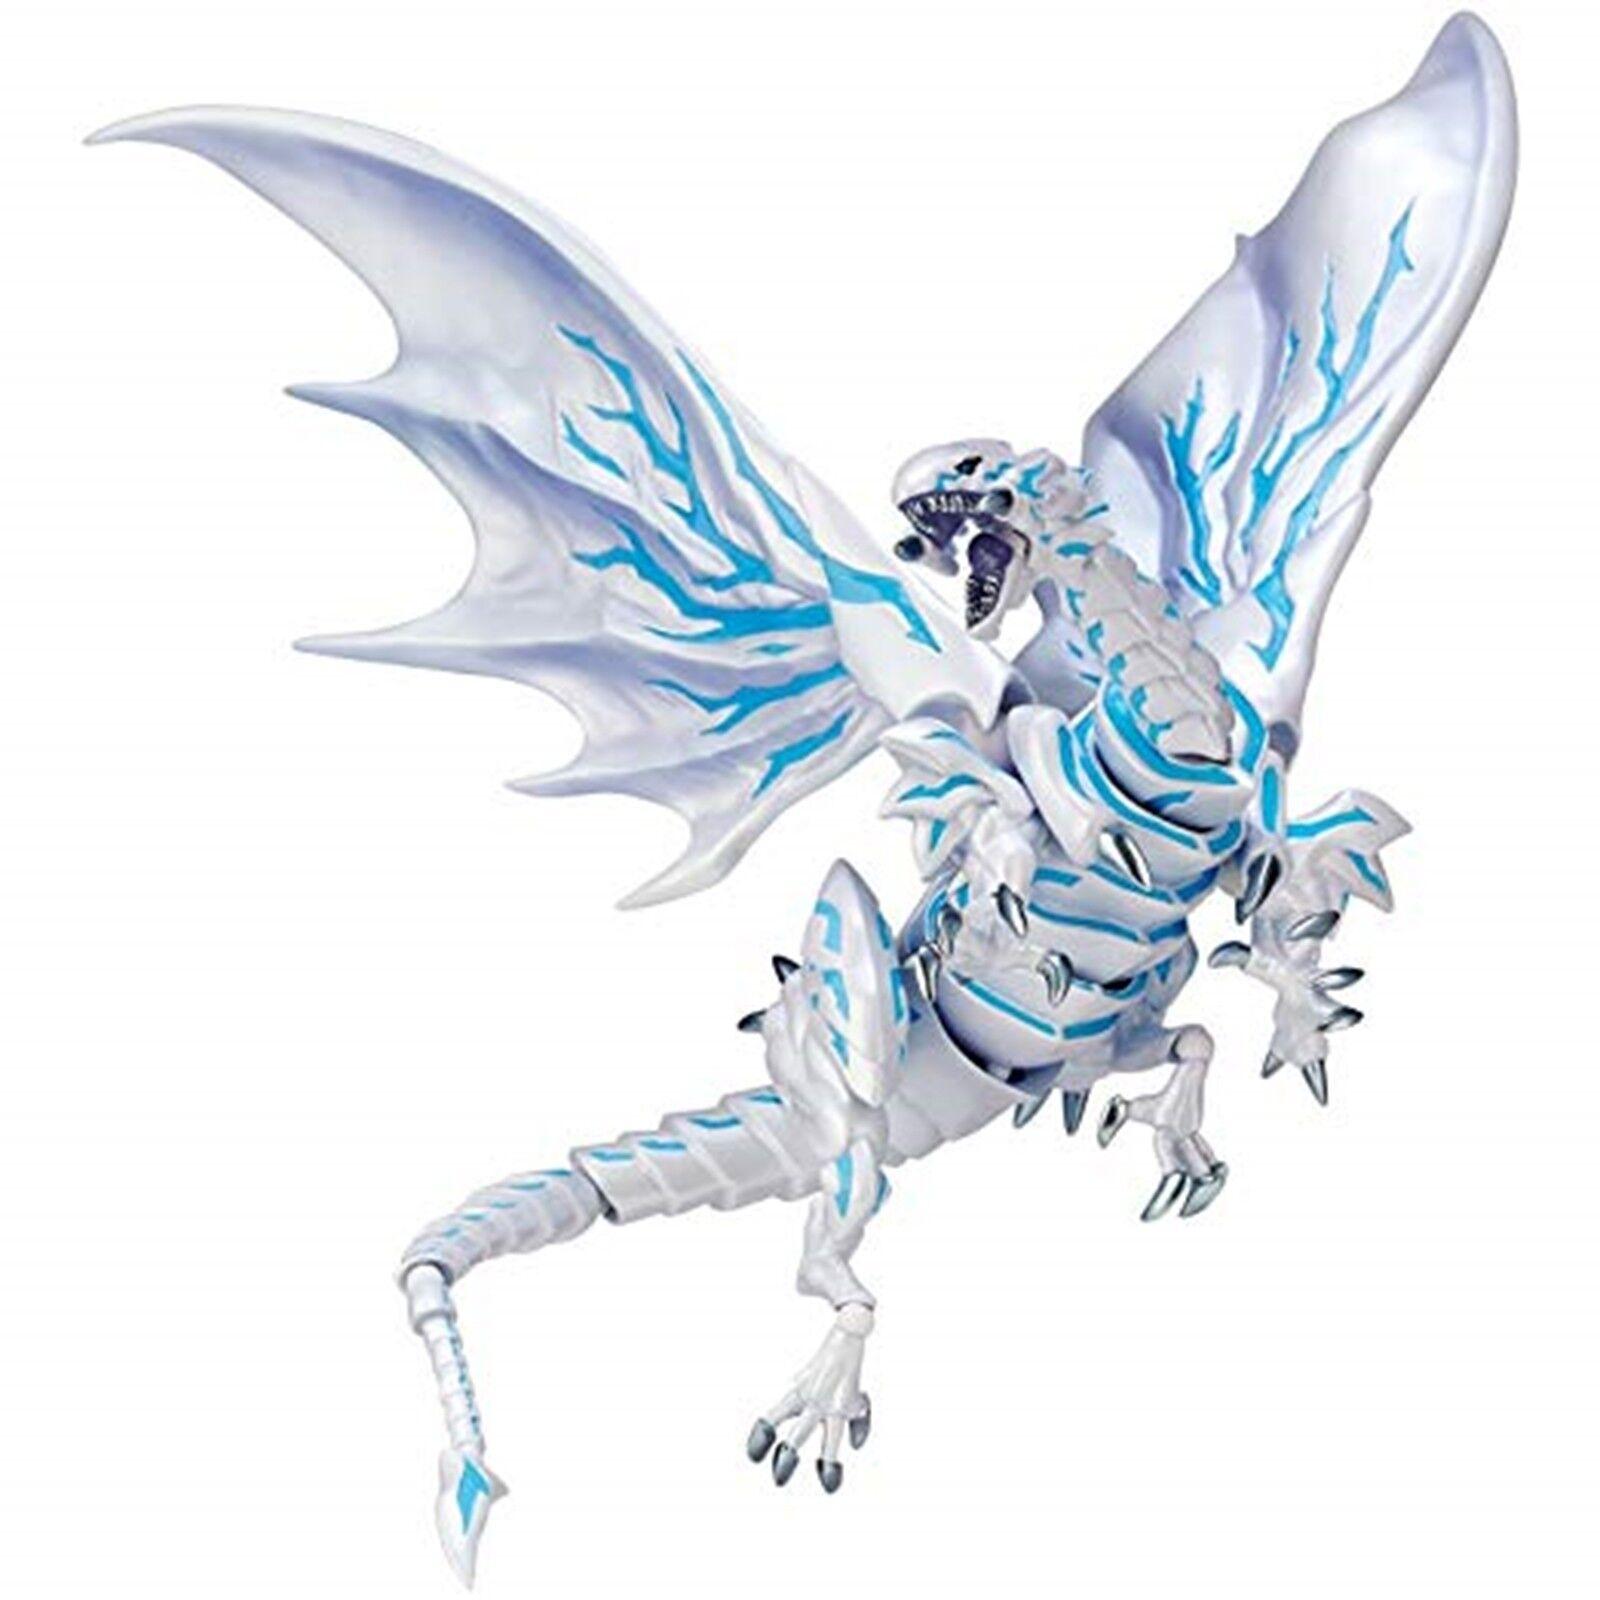 Unión Creative vulcanlog 013 Yu-Gi-Oh Dragón Blanco de ojos azules alternativa utilizada